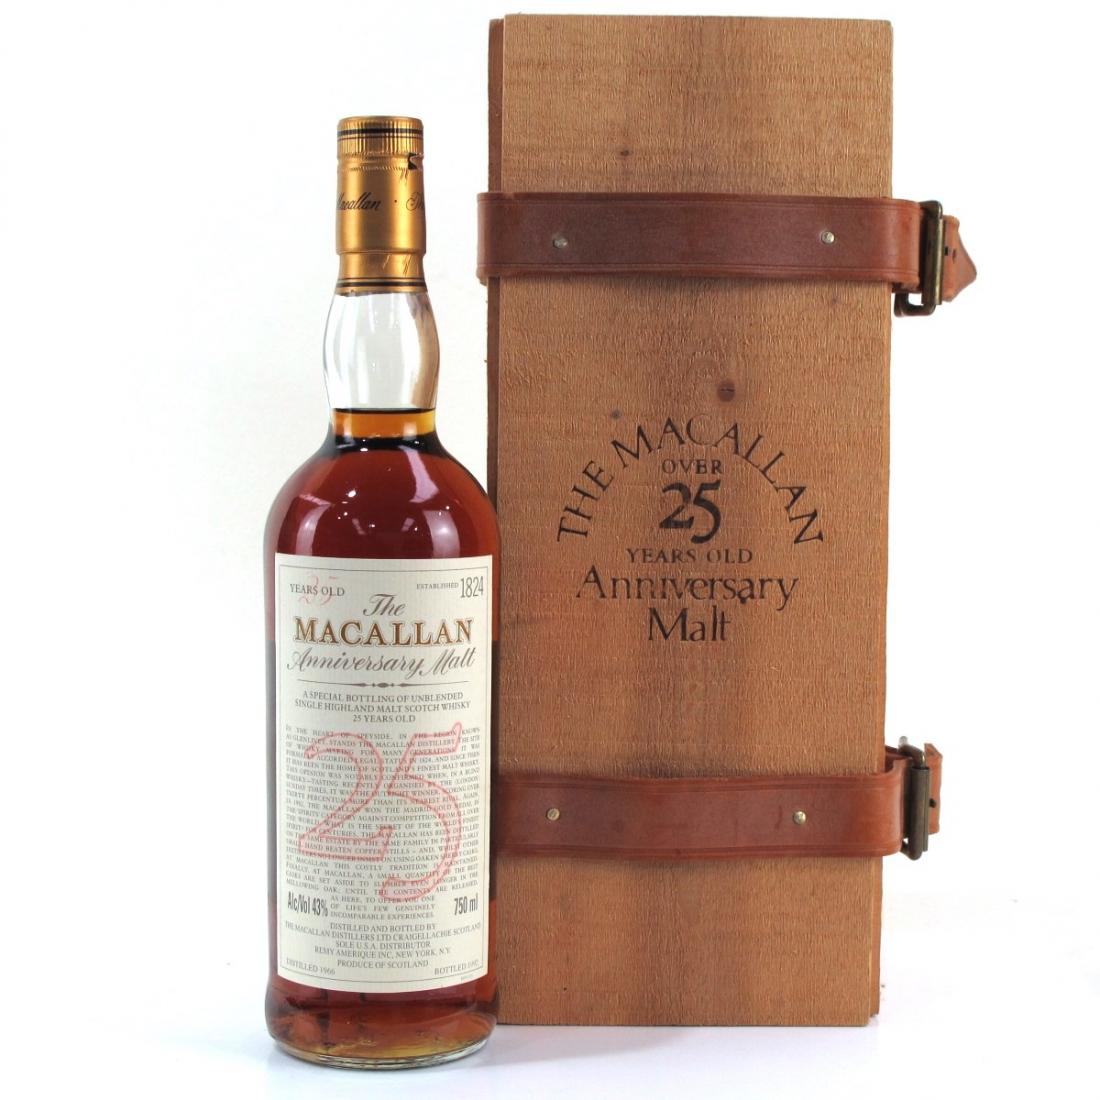 Macallan 1966 Anniversary Malt 25 Year Old 75cl / US Import